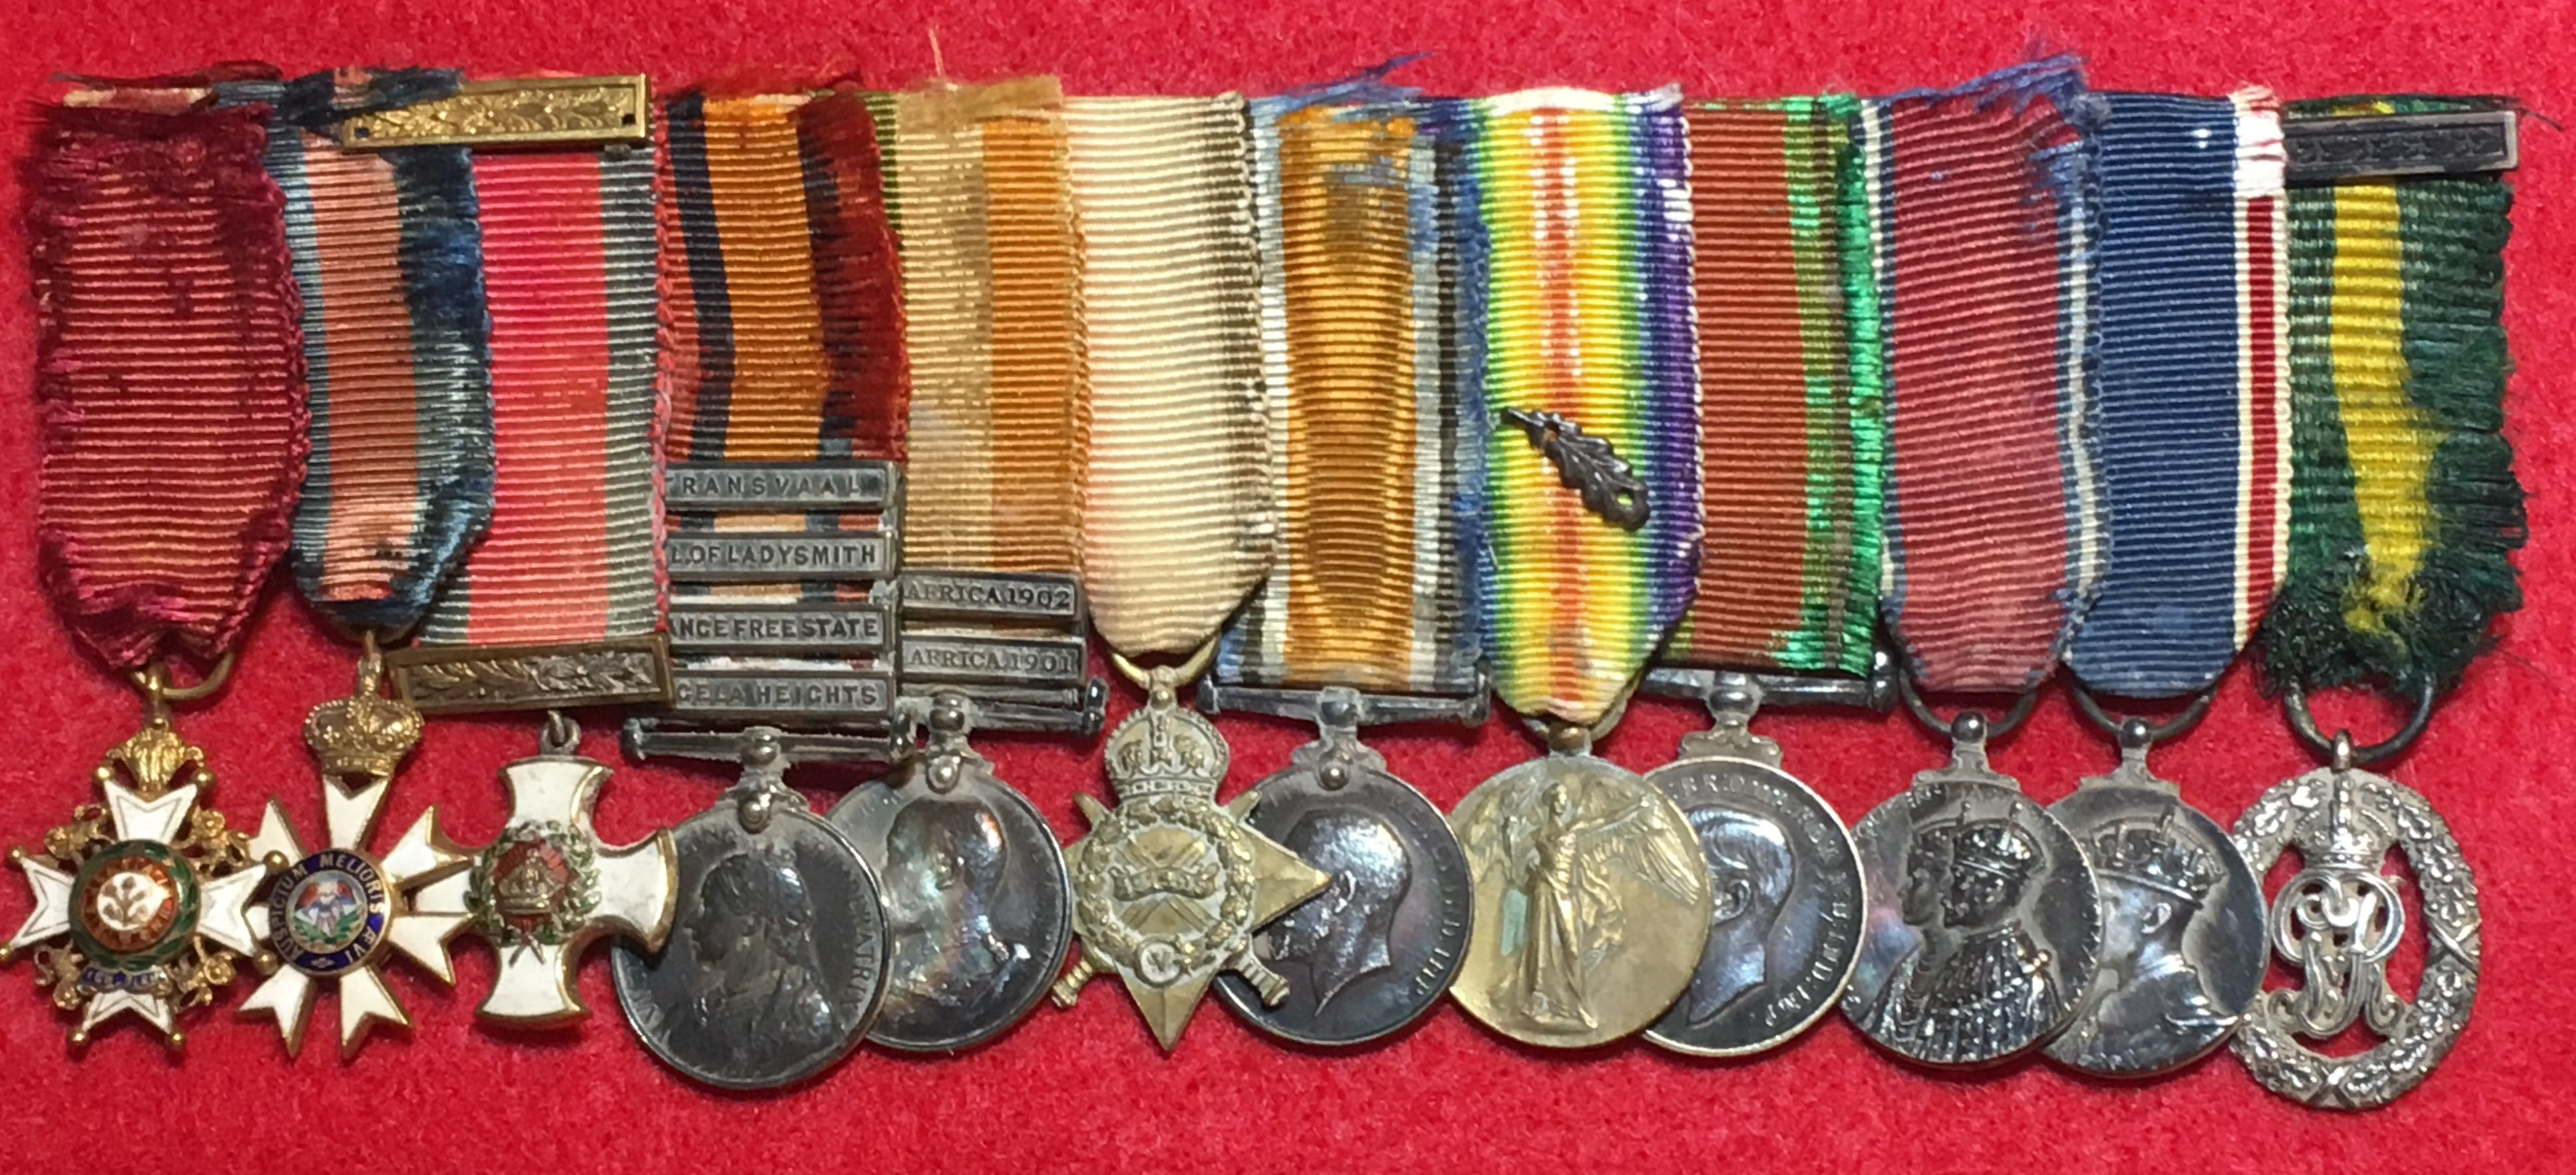 Details about Original World War 1 WW1 WWI UK British Miniature